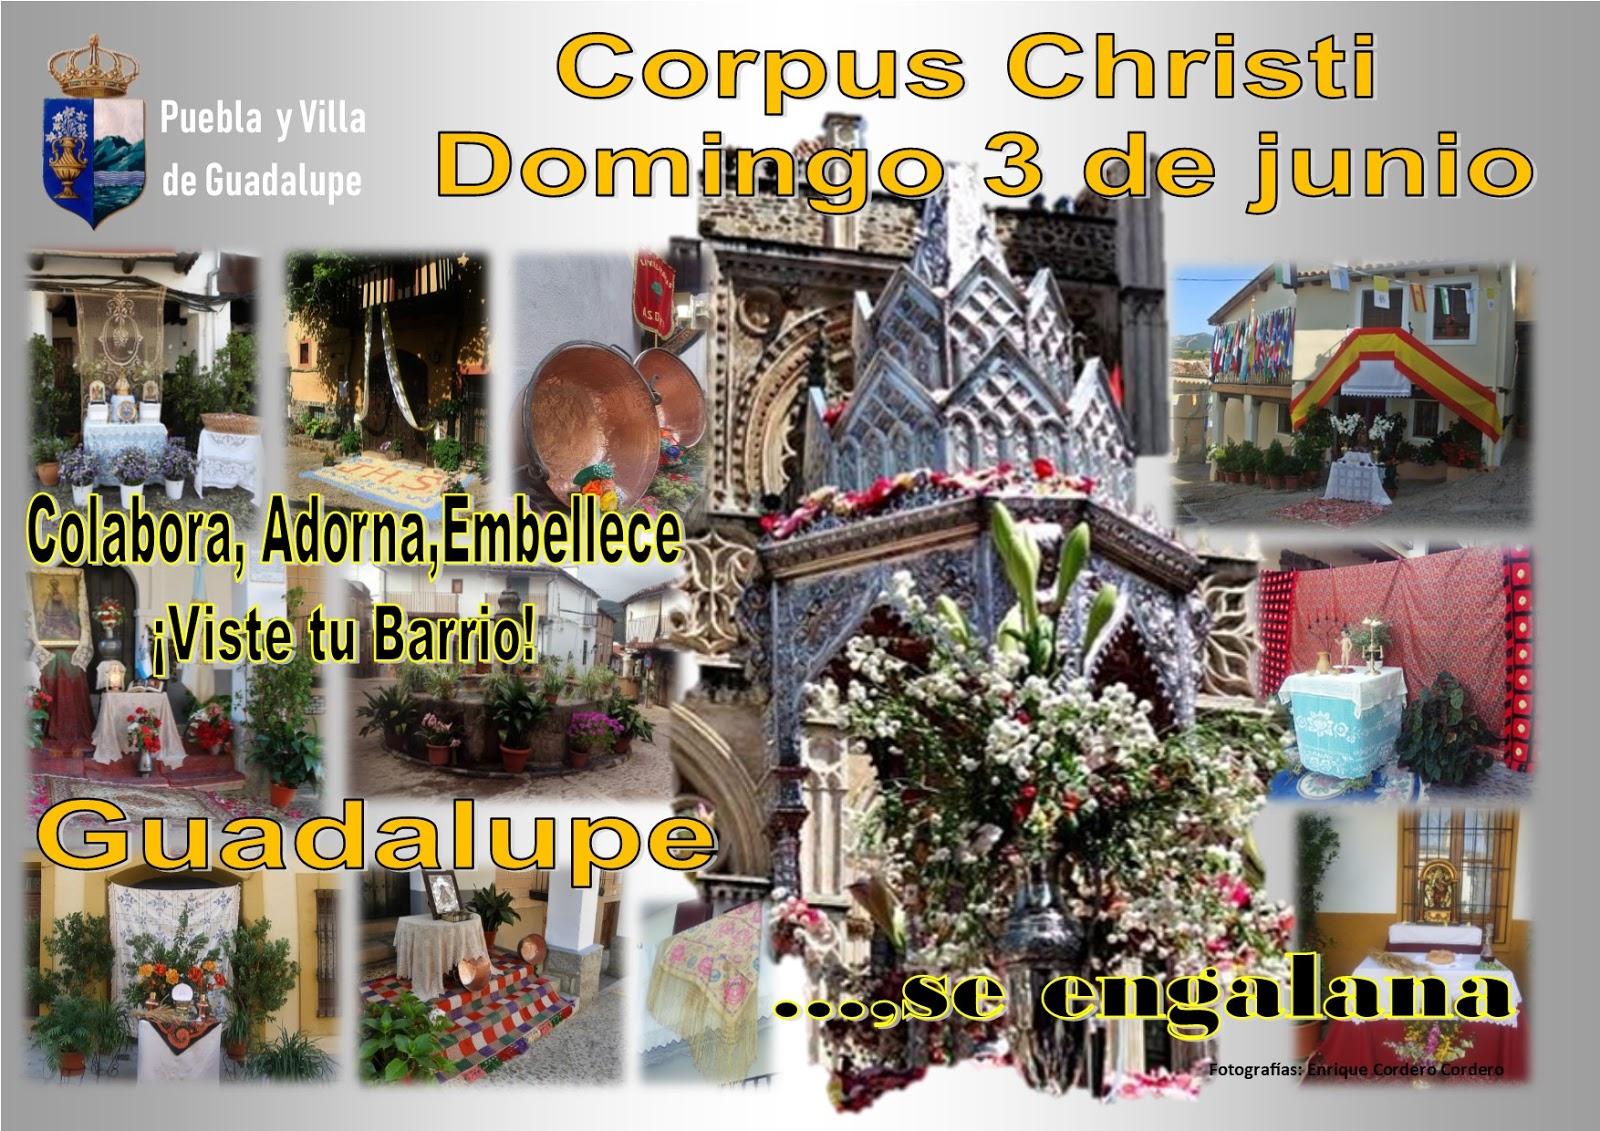 Corpus Christi 2018 - Guadalupe